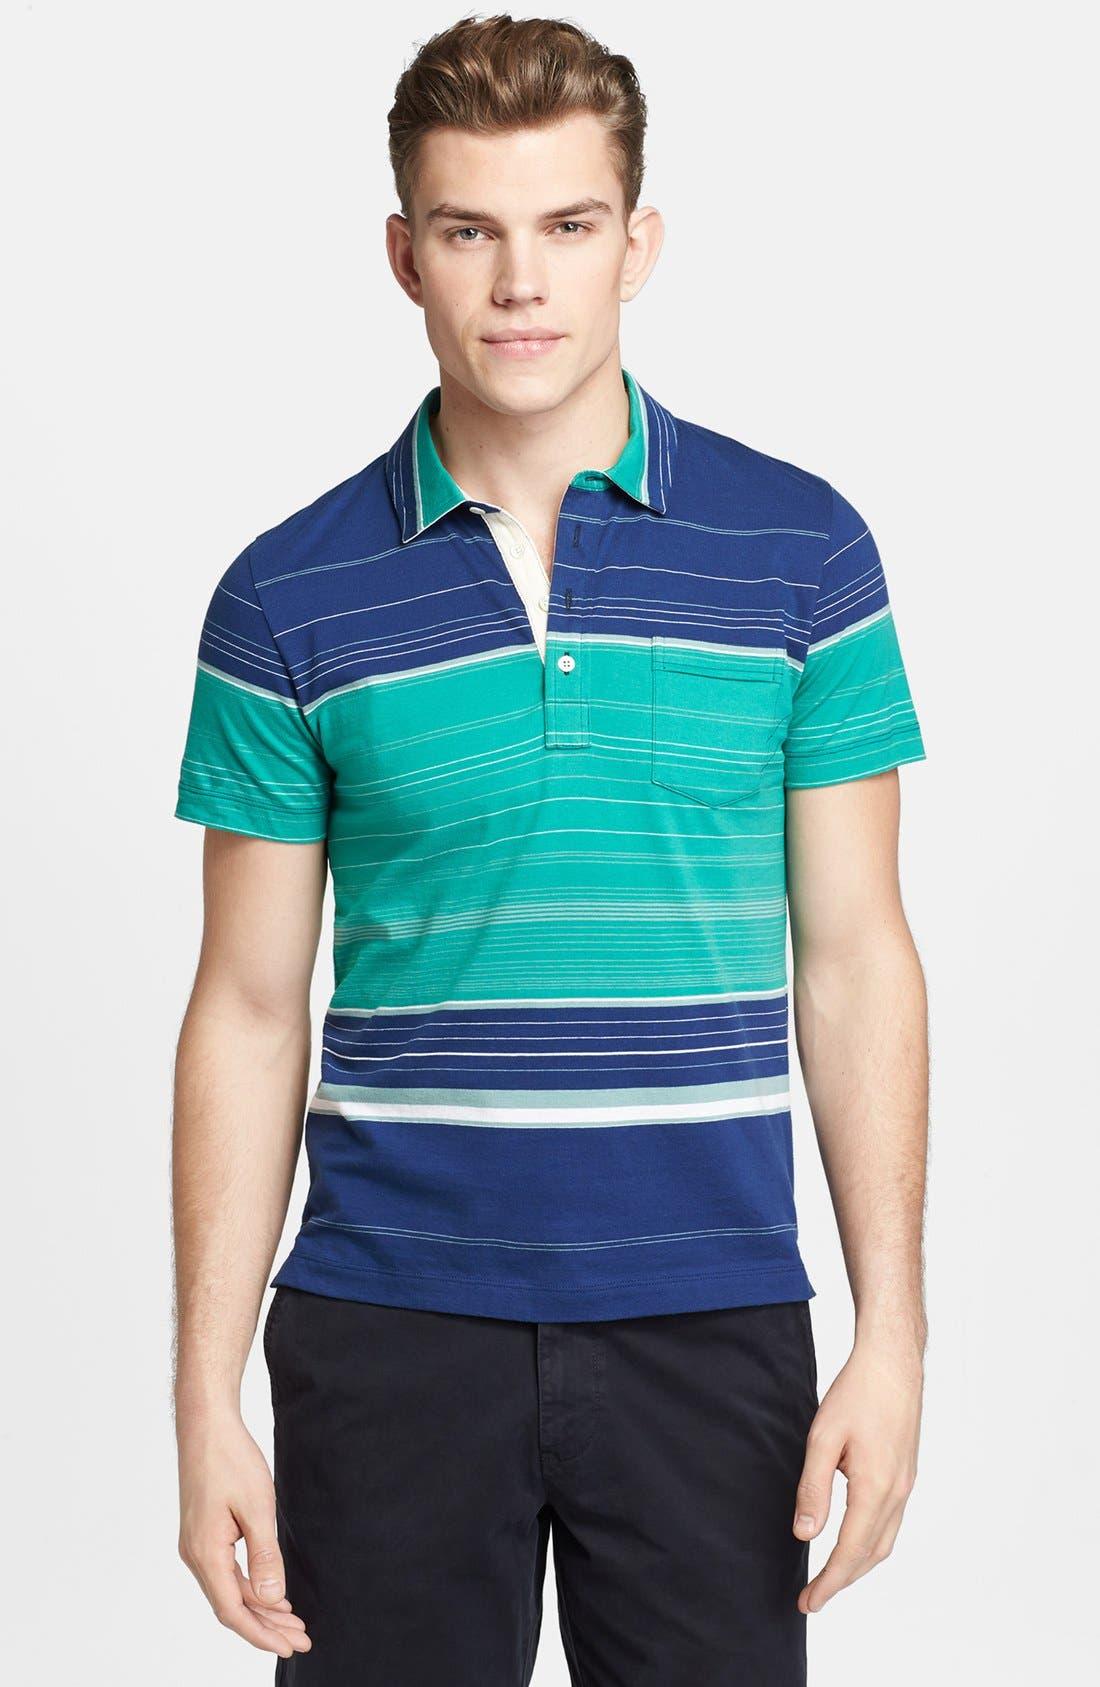 Alternate Image 1 Selected - Billy Reid 'Pensacola' Block Stripe Jersey Polo